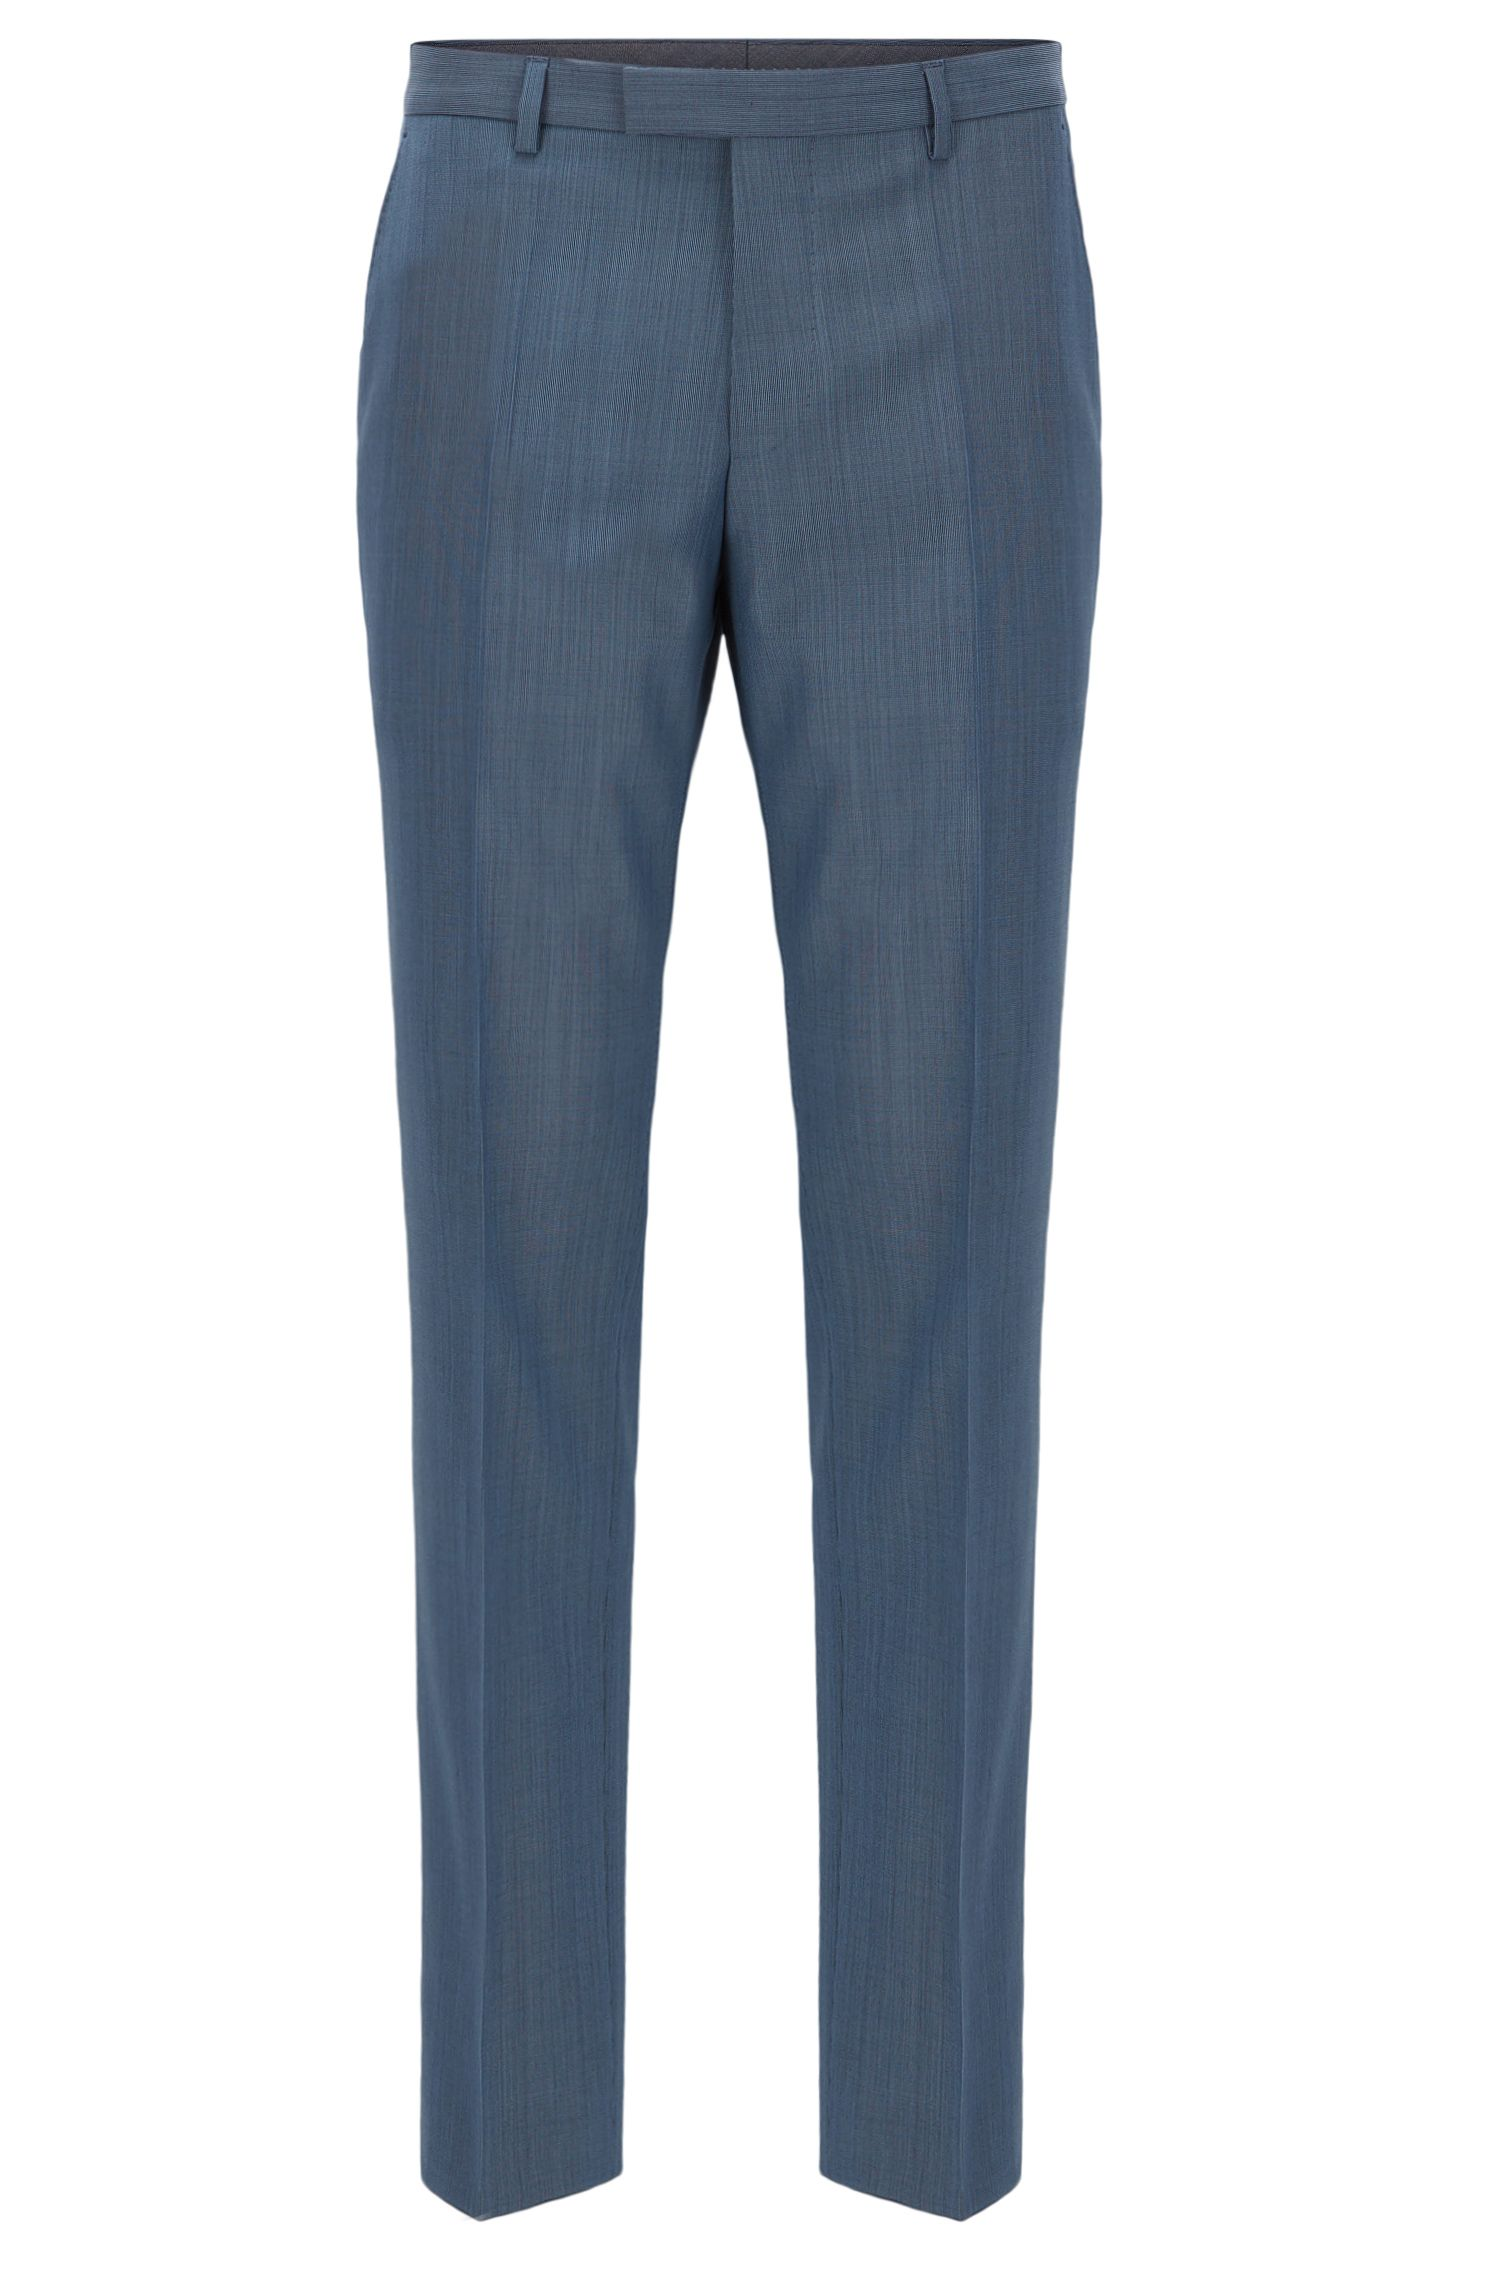 'Leenon' | Nailhead Virgin Wool Dress Pants